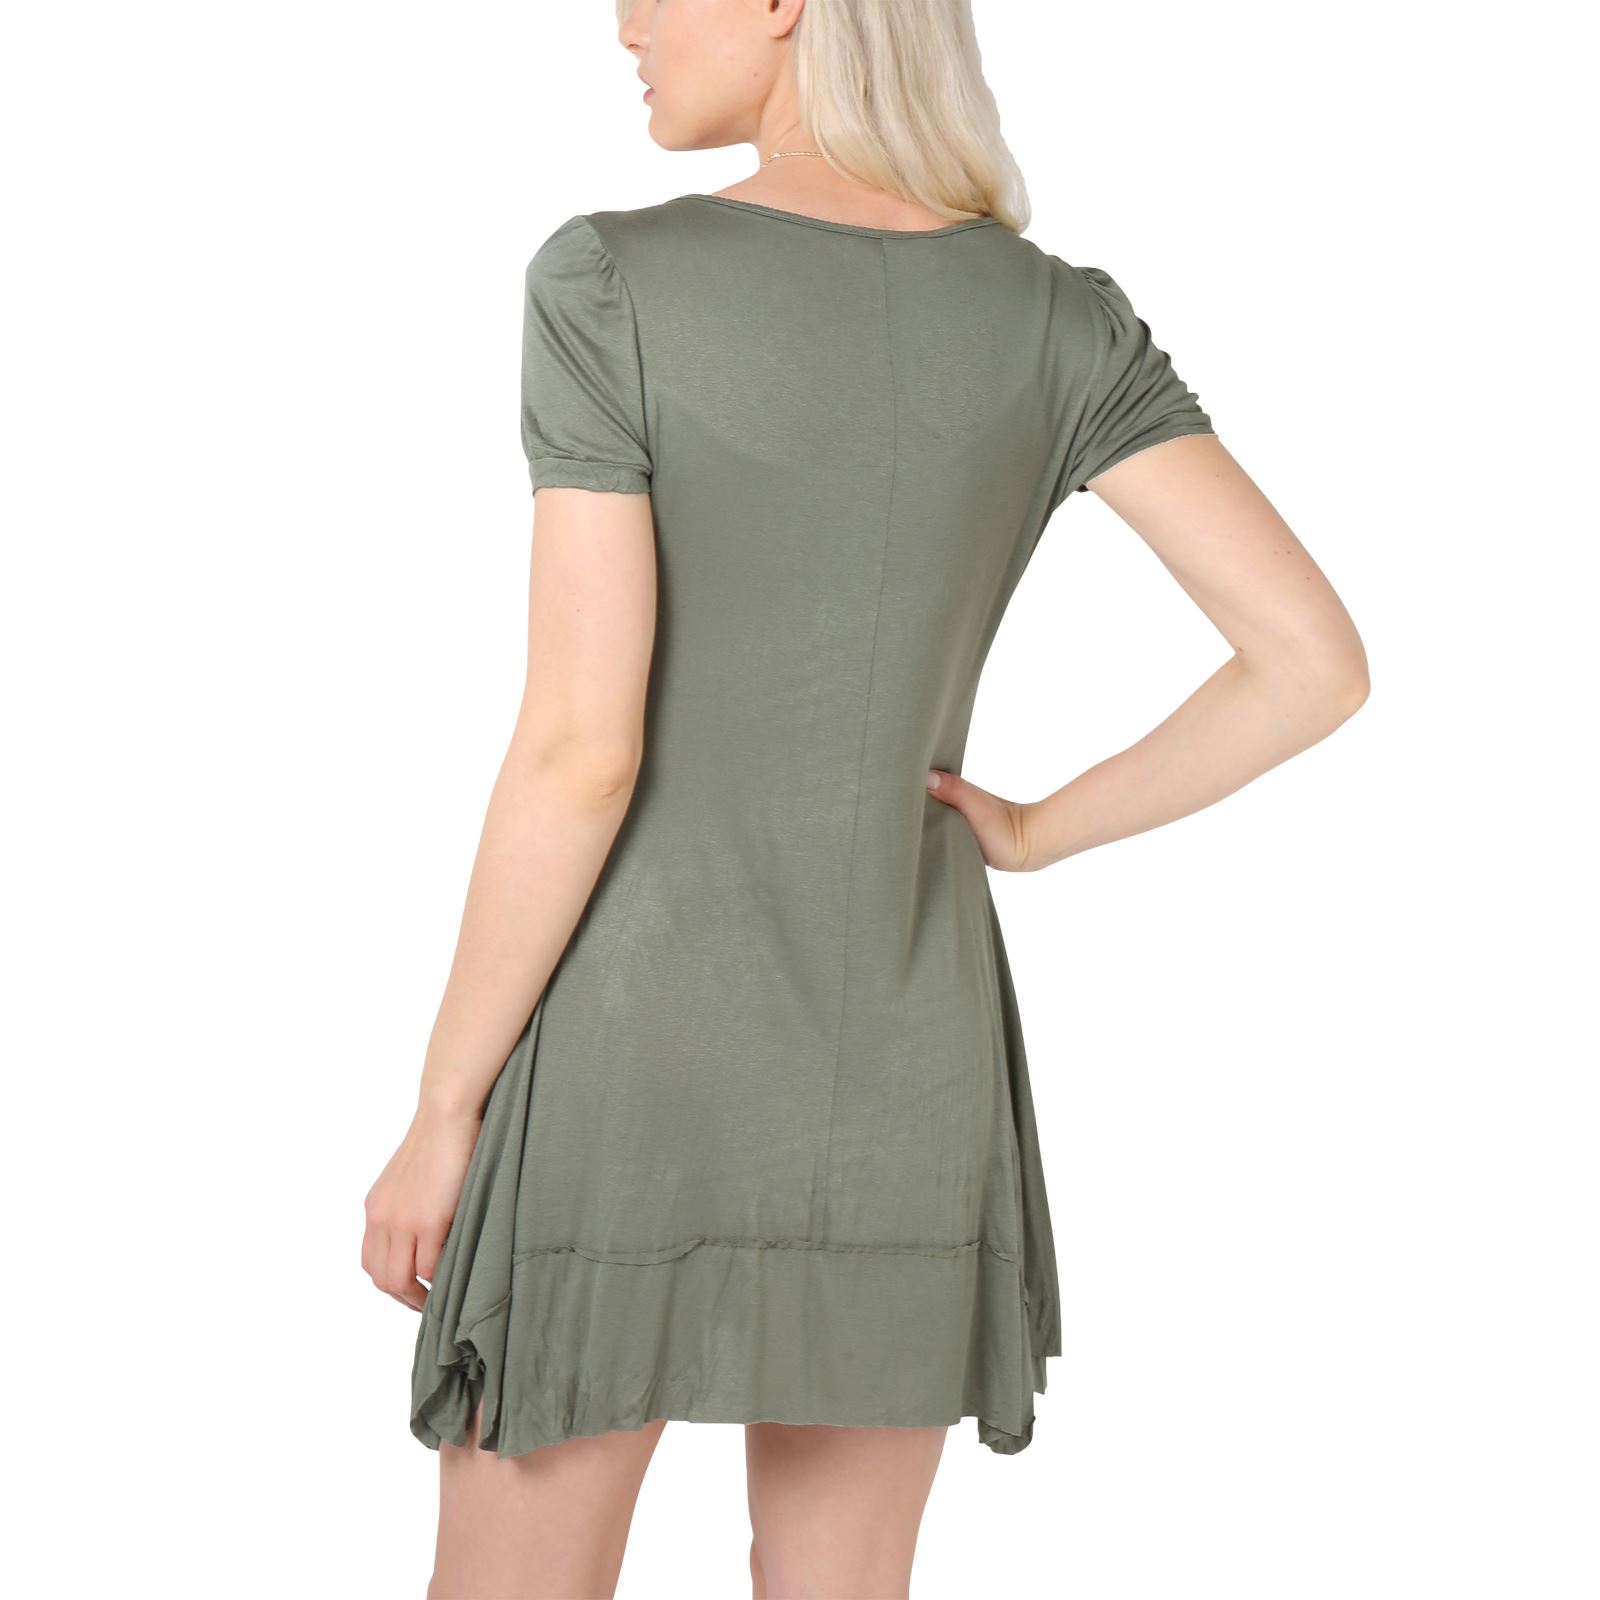 KRISP-Women-2-in-1-Boho-Gypsy-Tunic-Dress-Top-Tee-Jersey-Pleated-A-Line-Necklace thumbnail 13